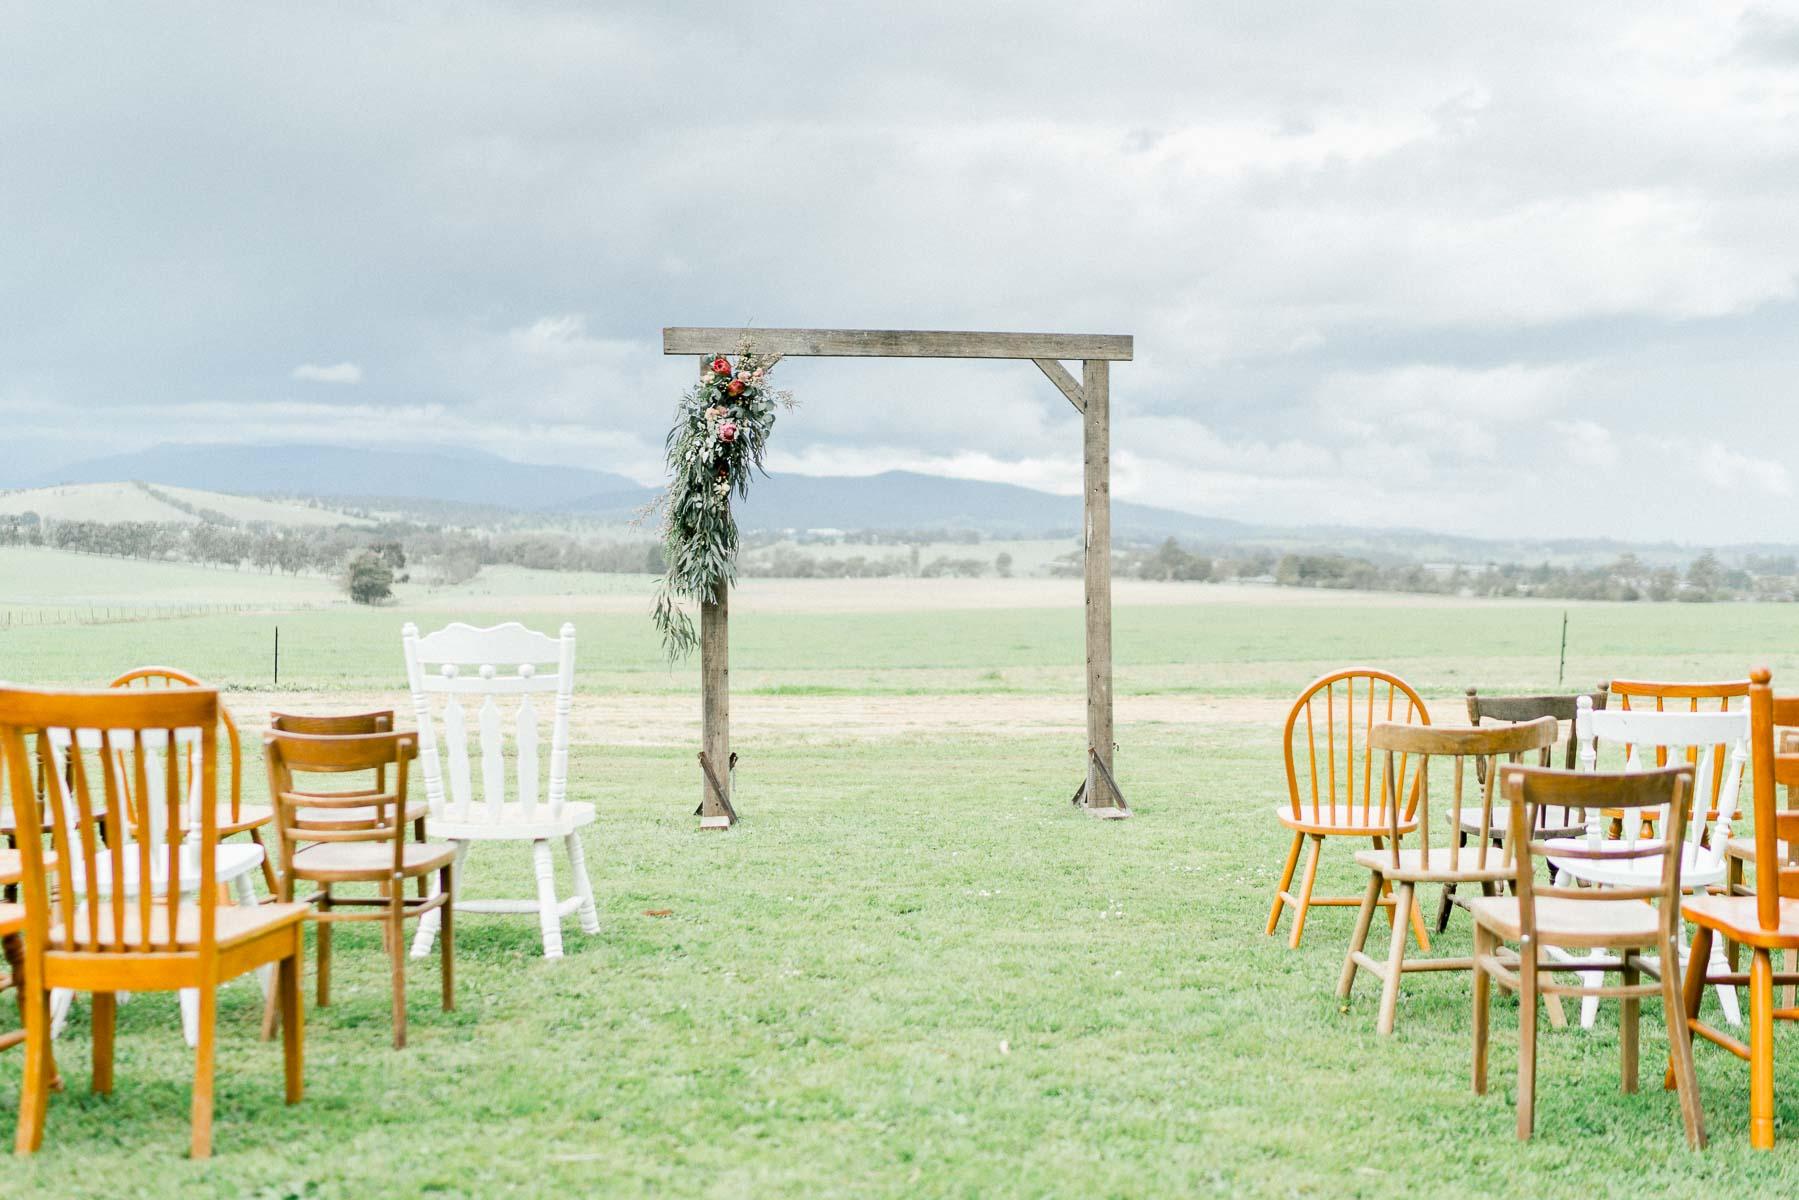 adams-farm-coldstream-yarra-valley-wedding-heart+soul-weddings-kel-jarryd-04742.jpg